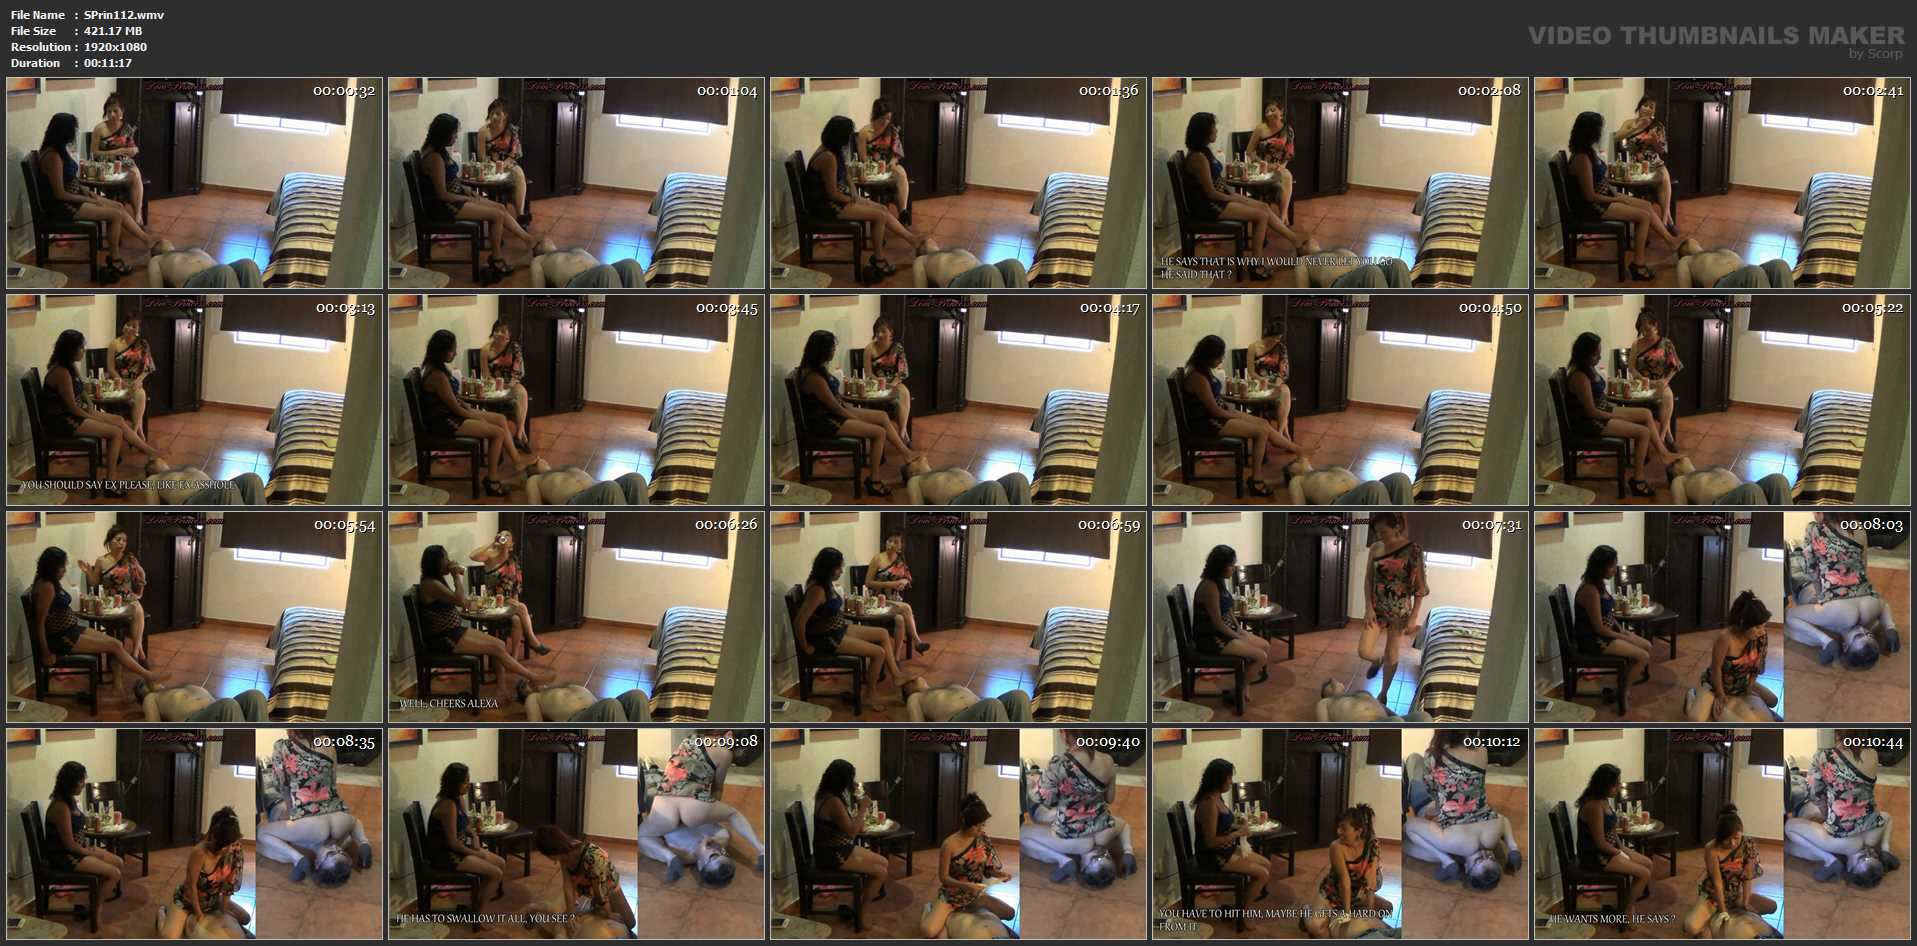 [SCAT-PRINCESS] Jessy brings her best Friend Part 1 [FULL HD][1080p][WMV]